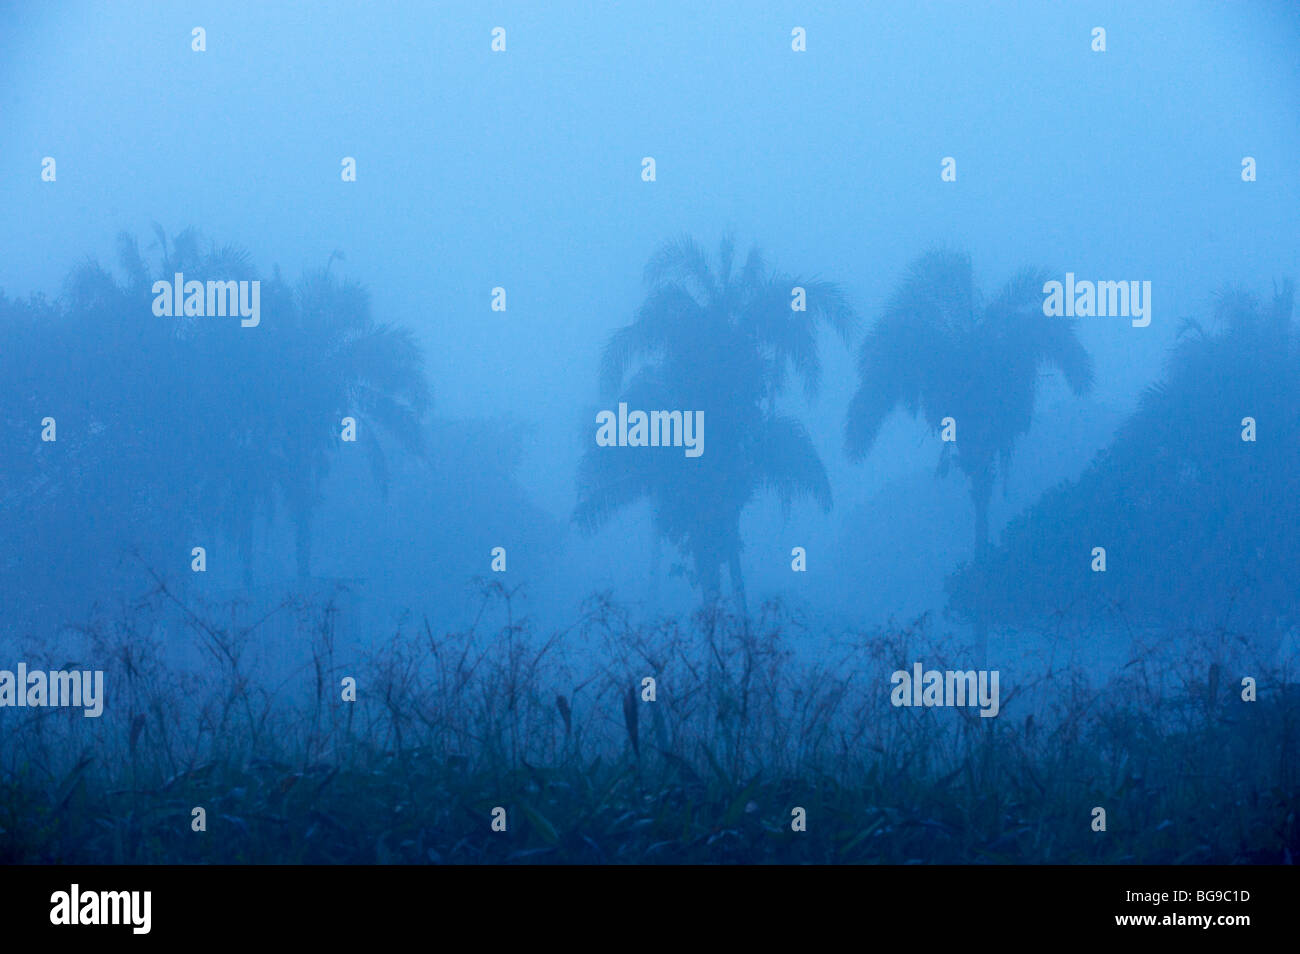 Landschaft mit Palmen und Nebel, PANTANAL, MATO GROSSO, Landschaft mit Palmen und Nebel, PANTANAL, MATO GROSSO, Stockbild